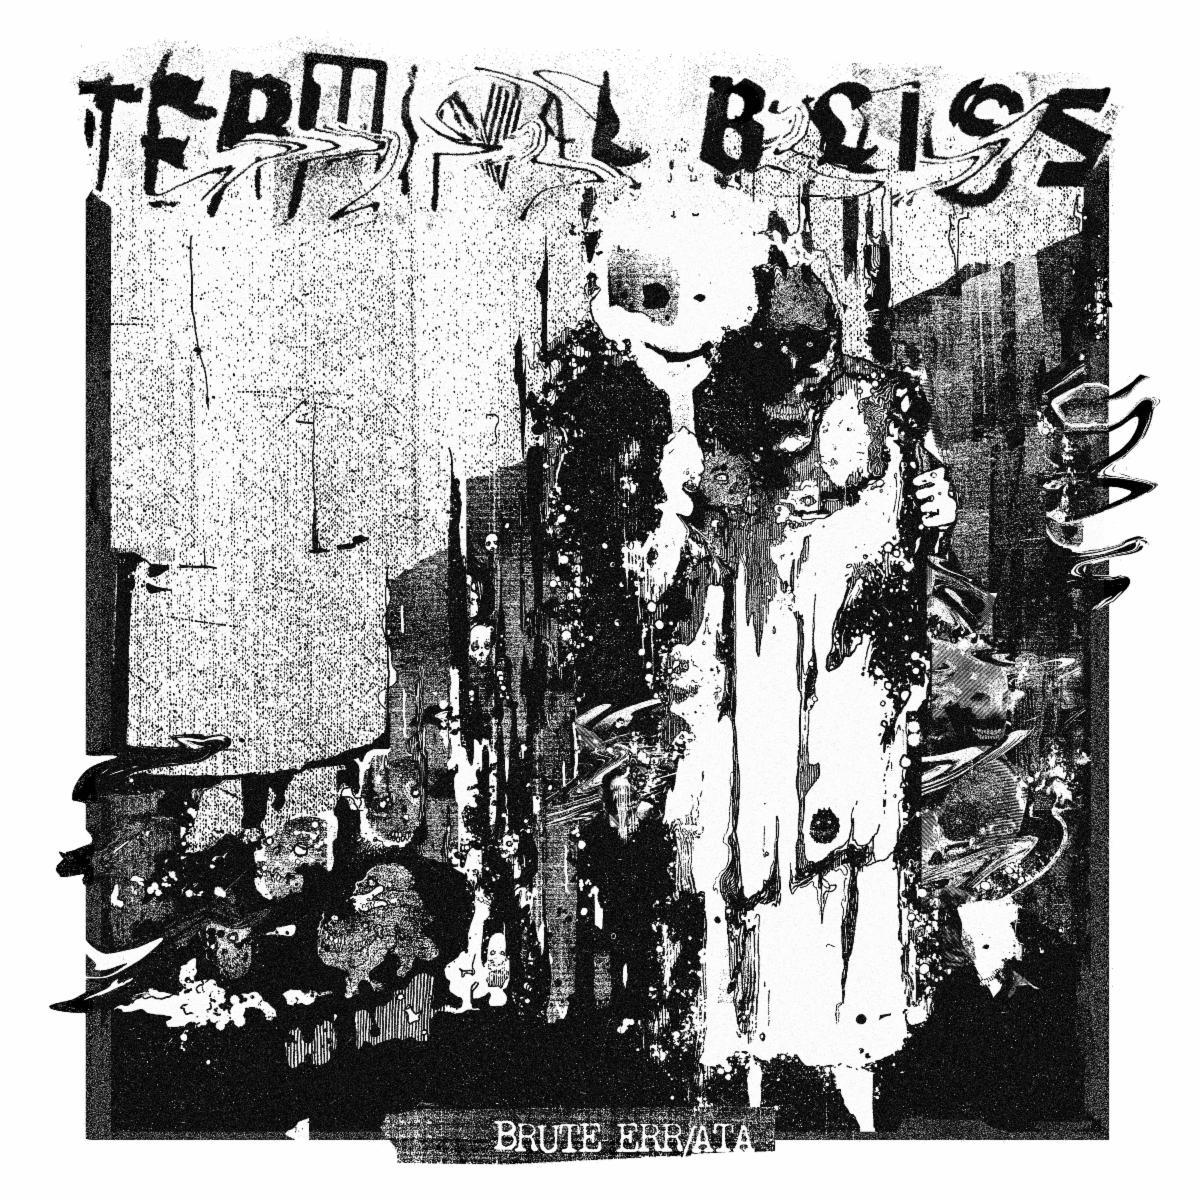 Terminal Bliss